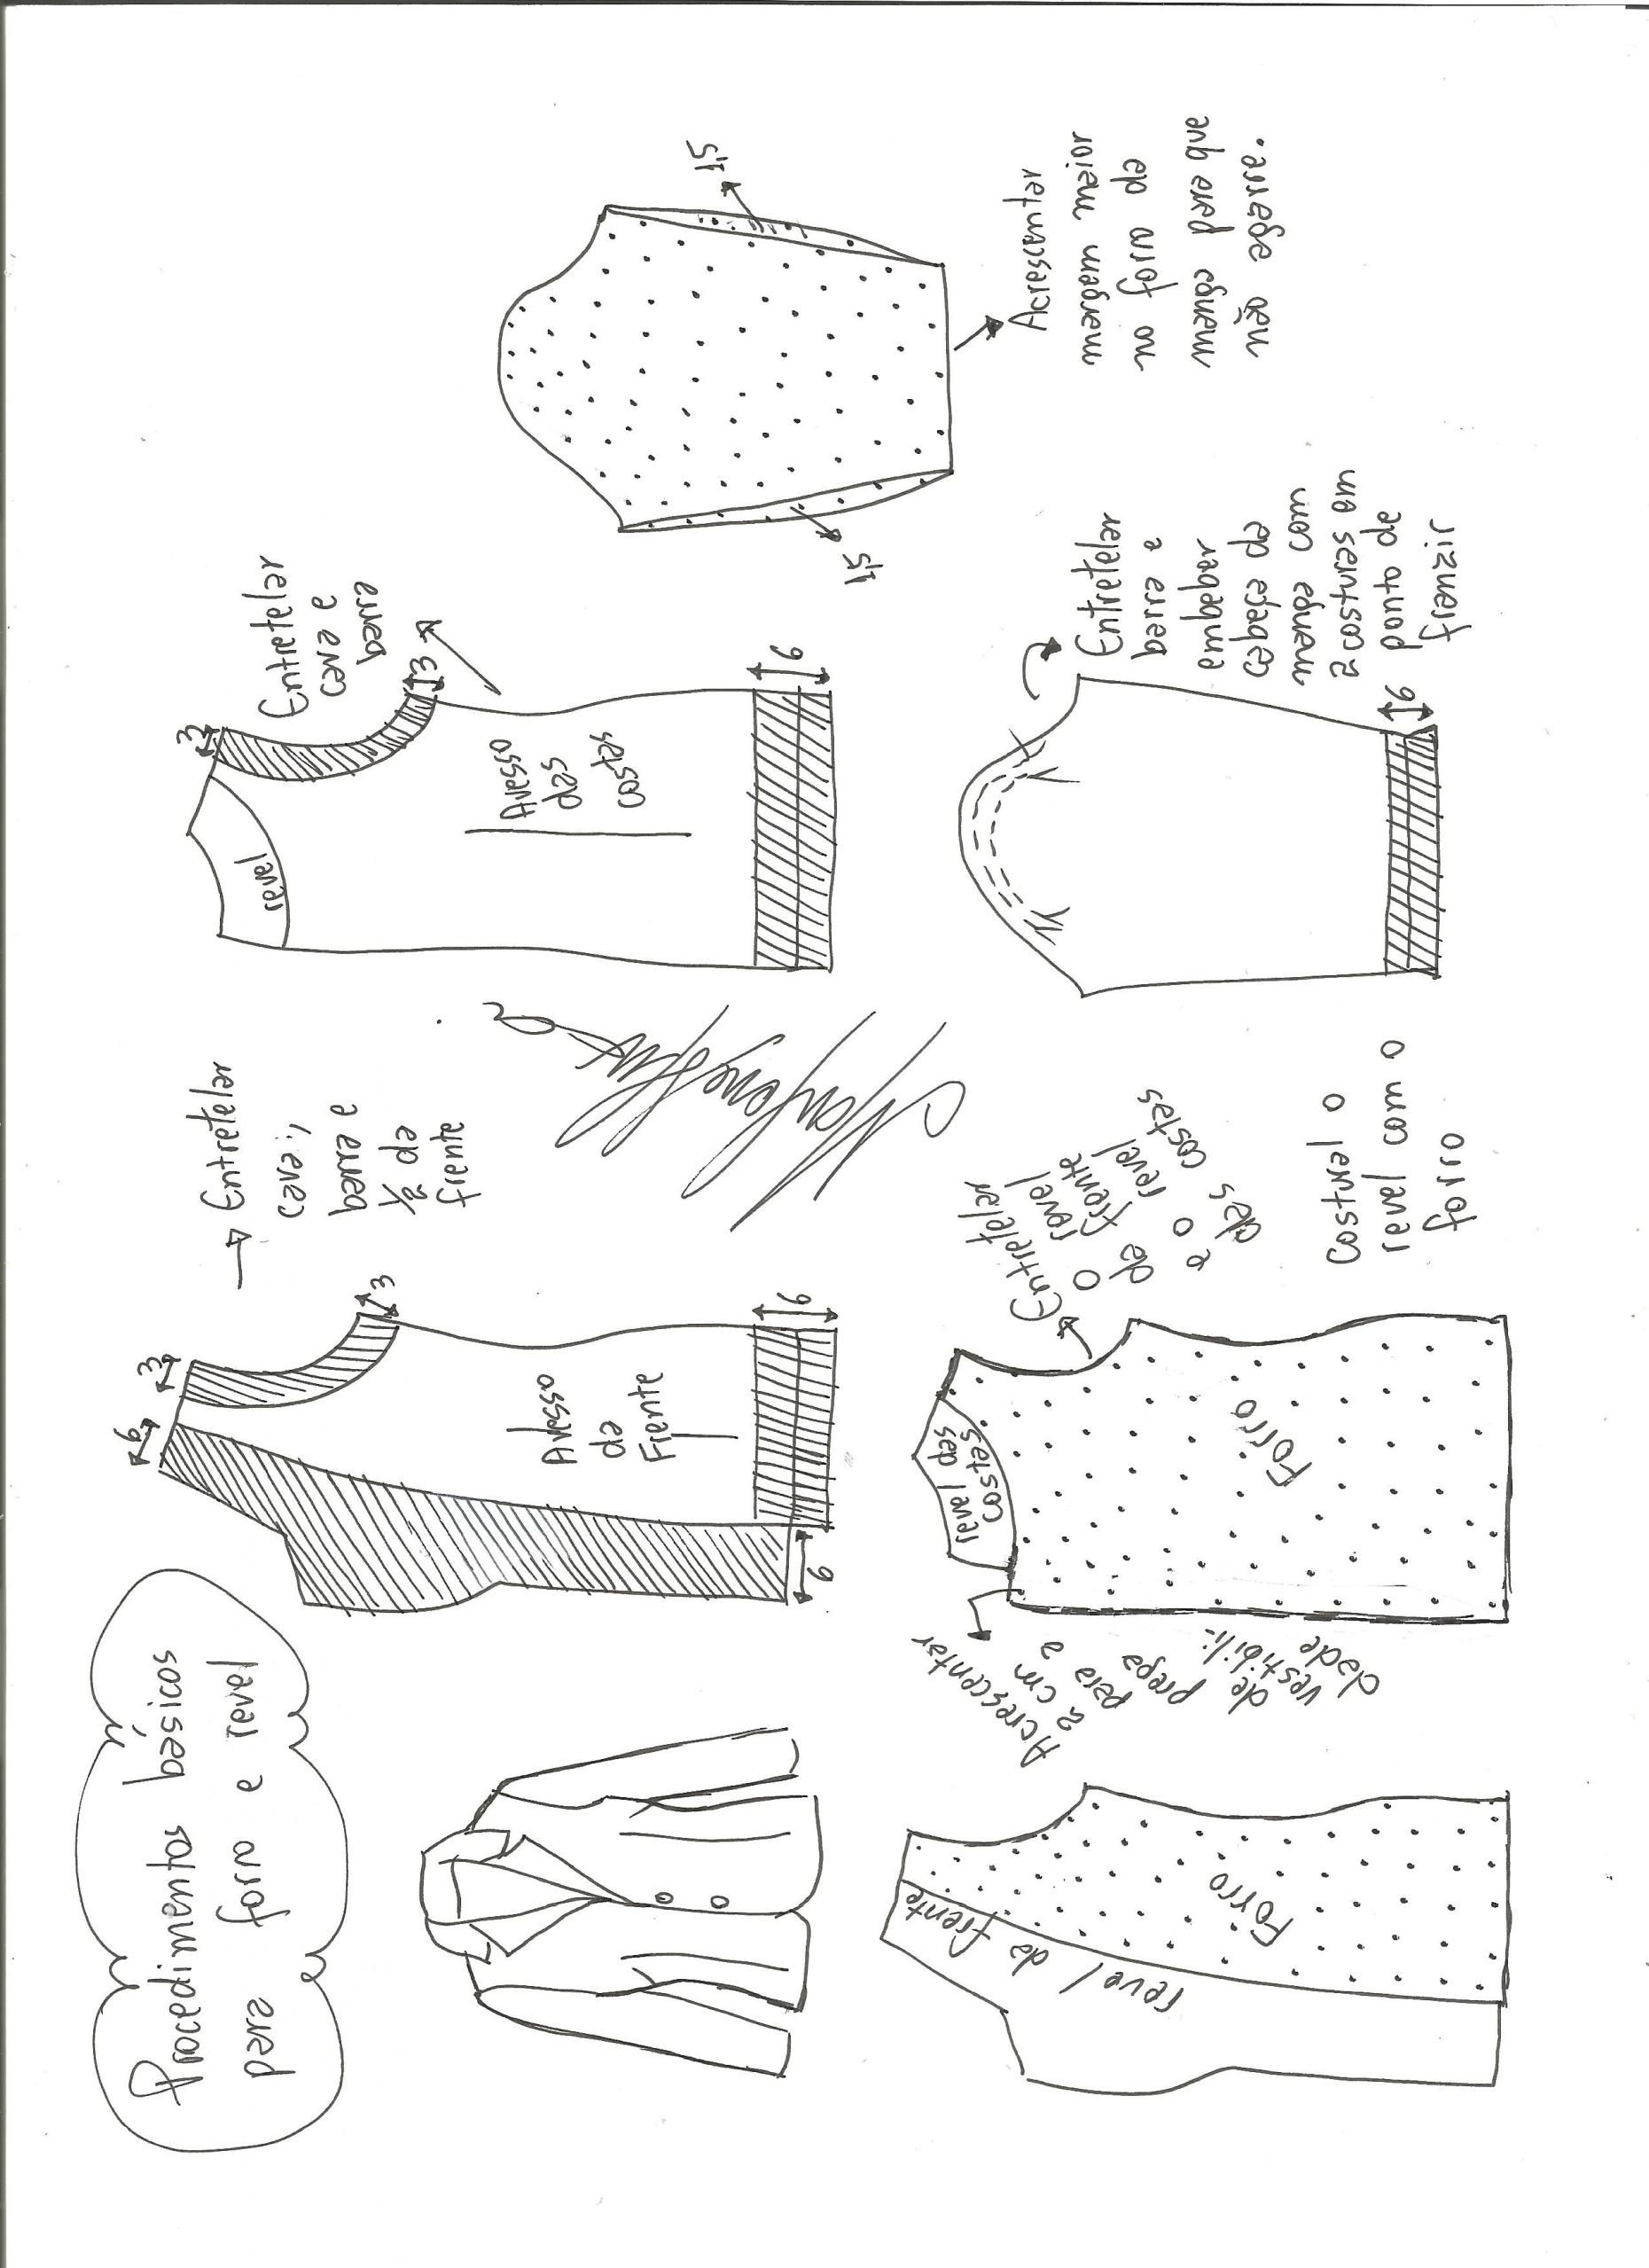 Blazer com Gola Tradicional | باتش وورك و خياطة | Pinterest ...